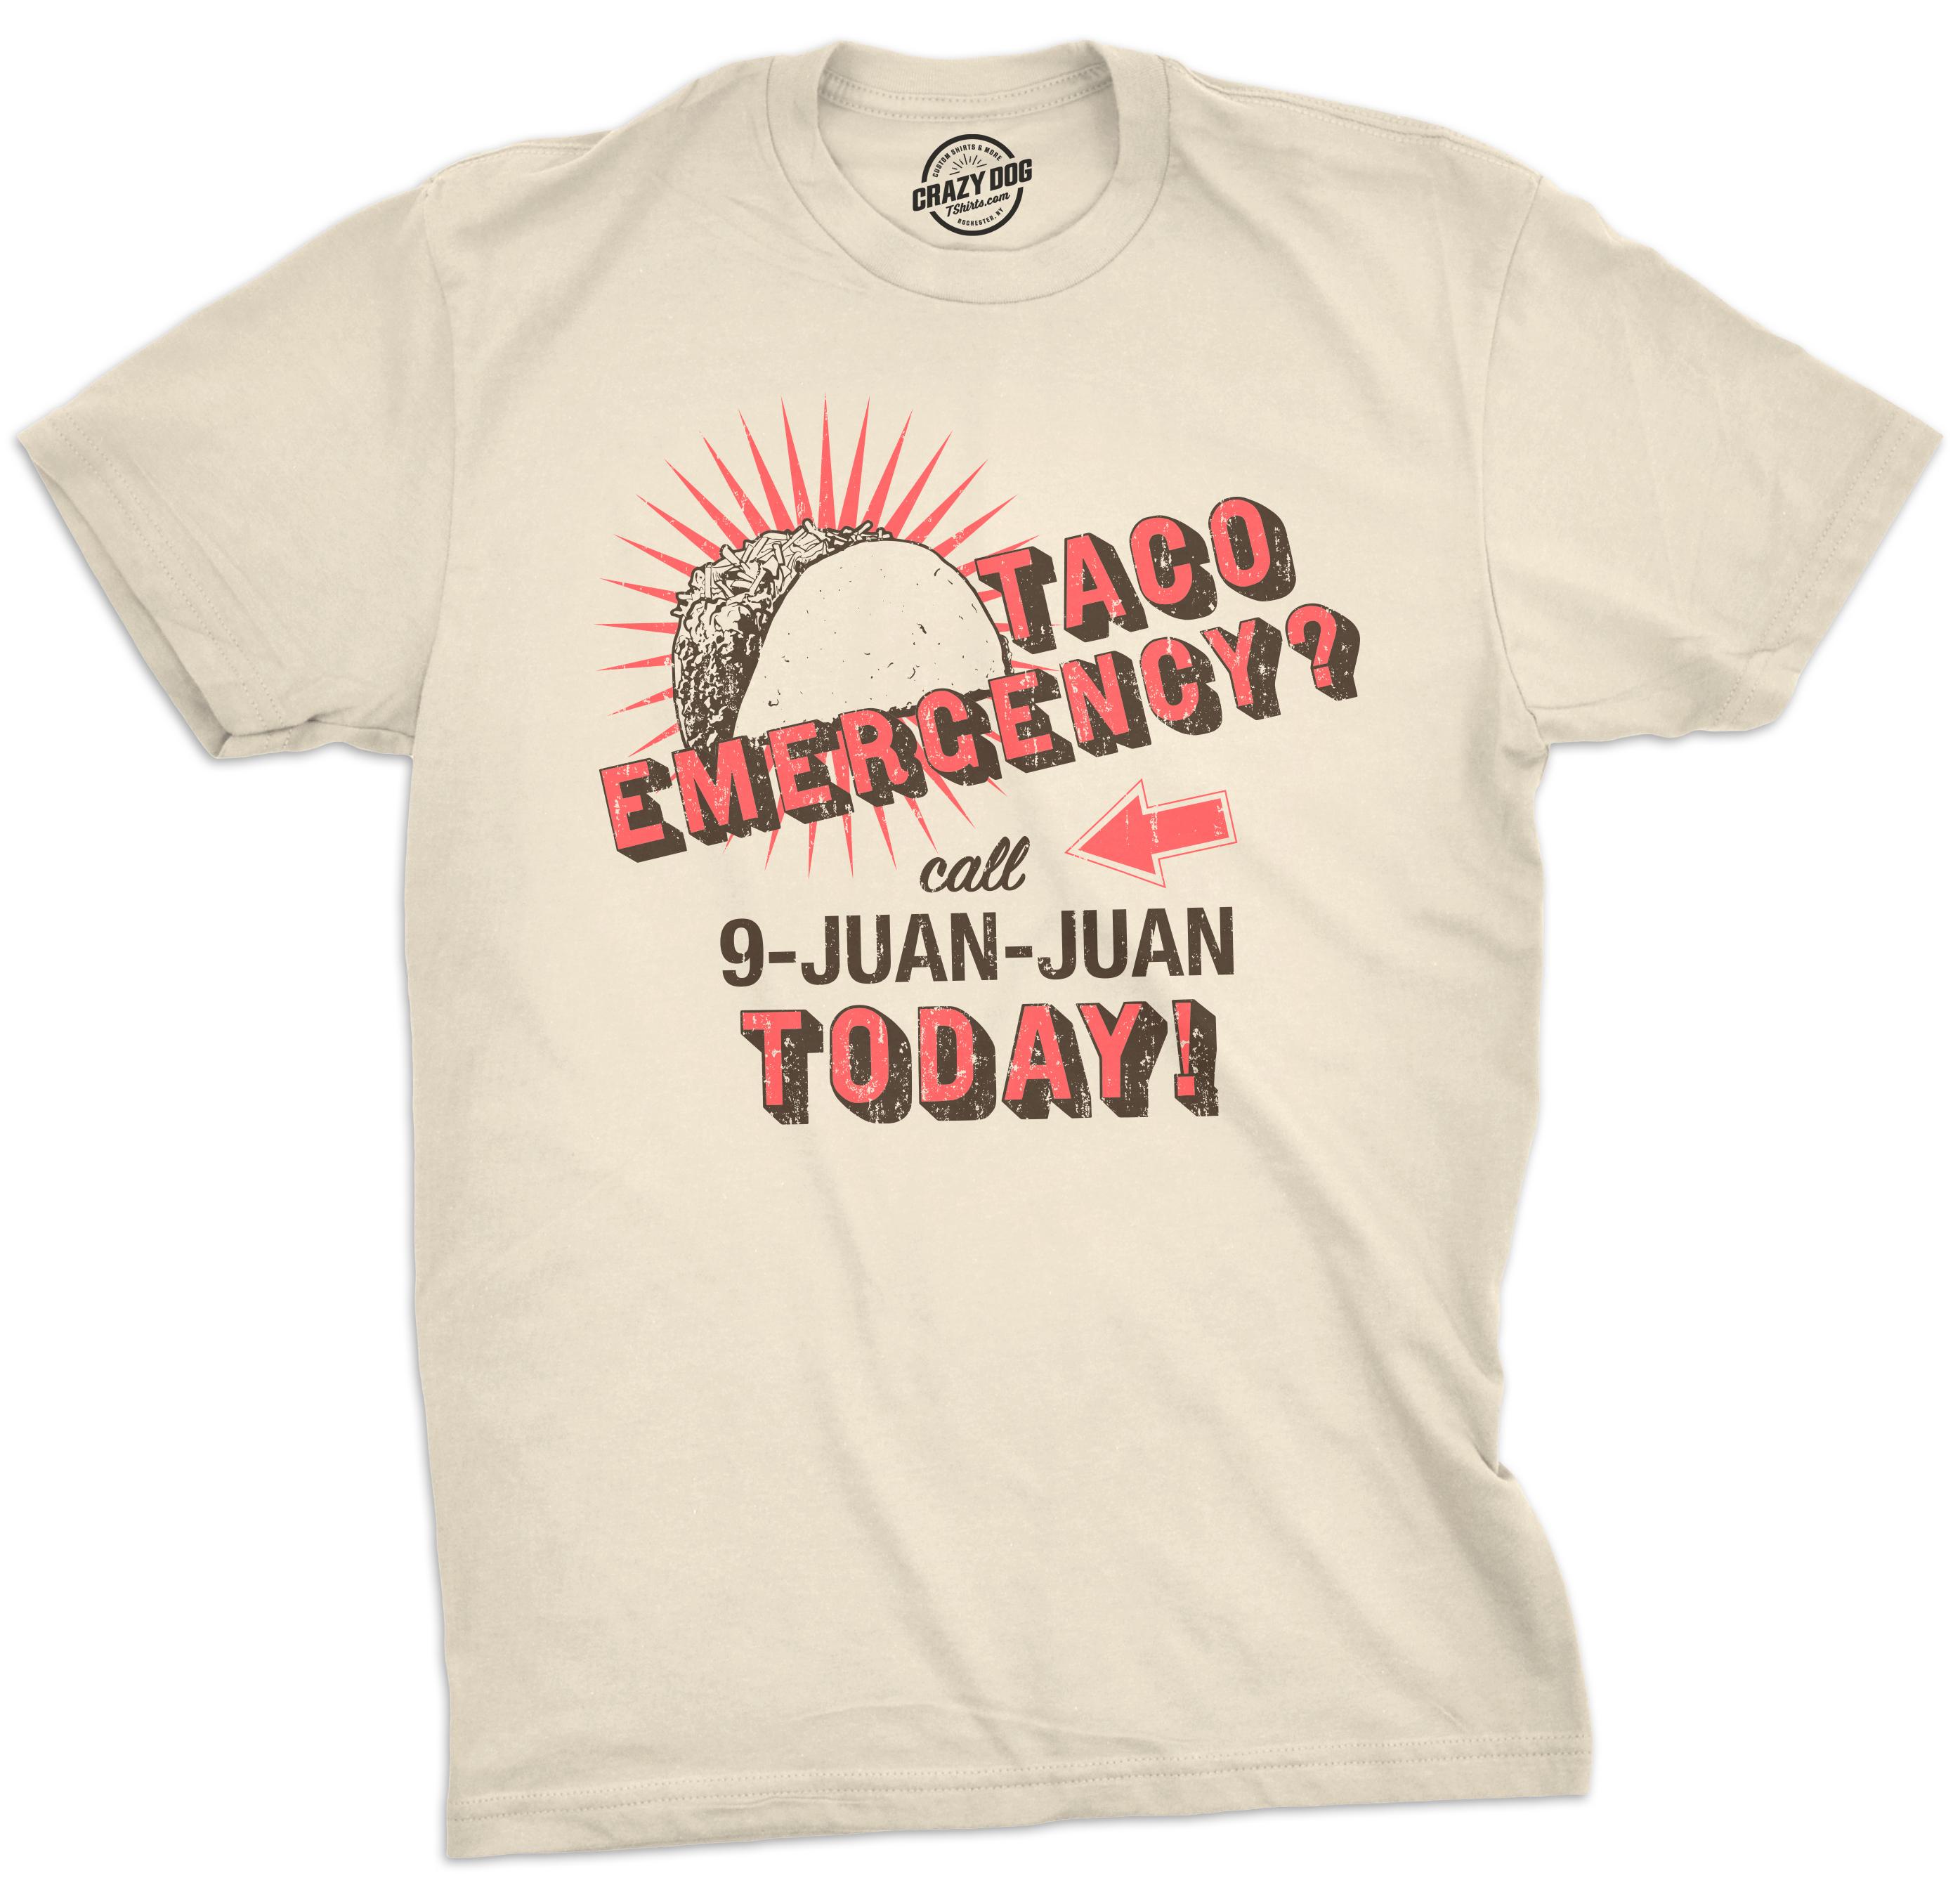 7cfab000 Mens Call 9 Juan Juan Tshirt Funny Cinco De Mayo Taco Burrito Tee For Guys  (Ivory) - S